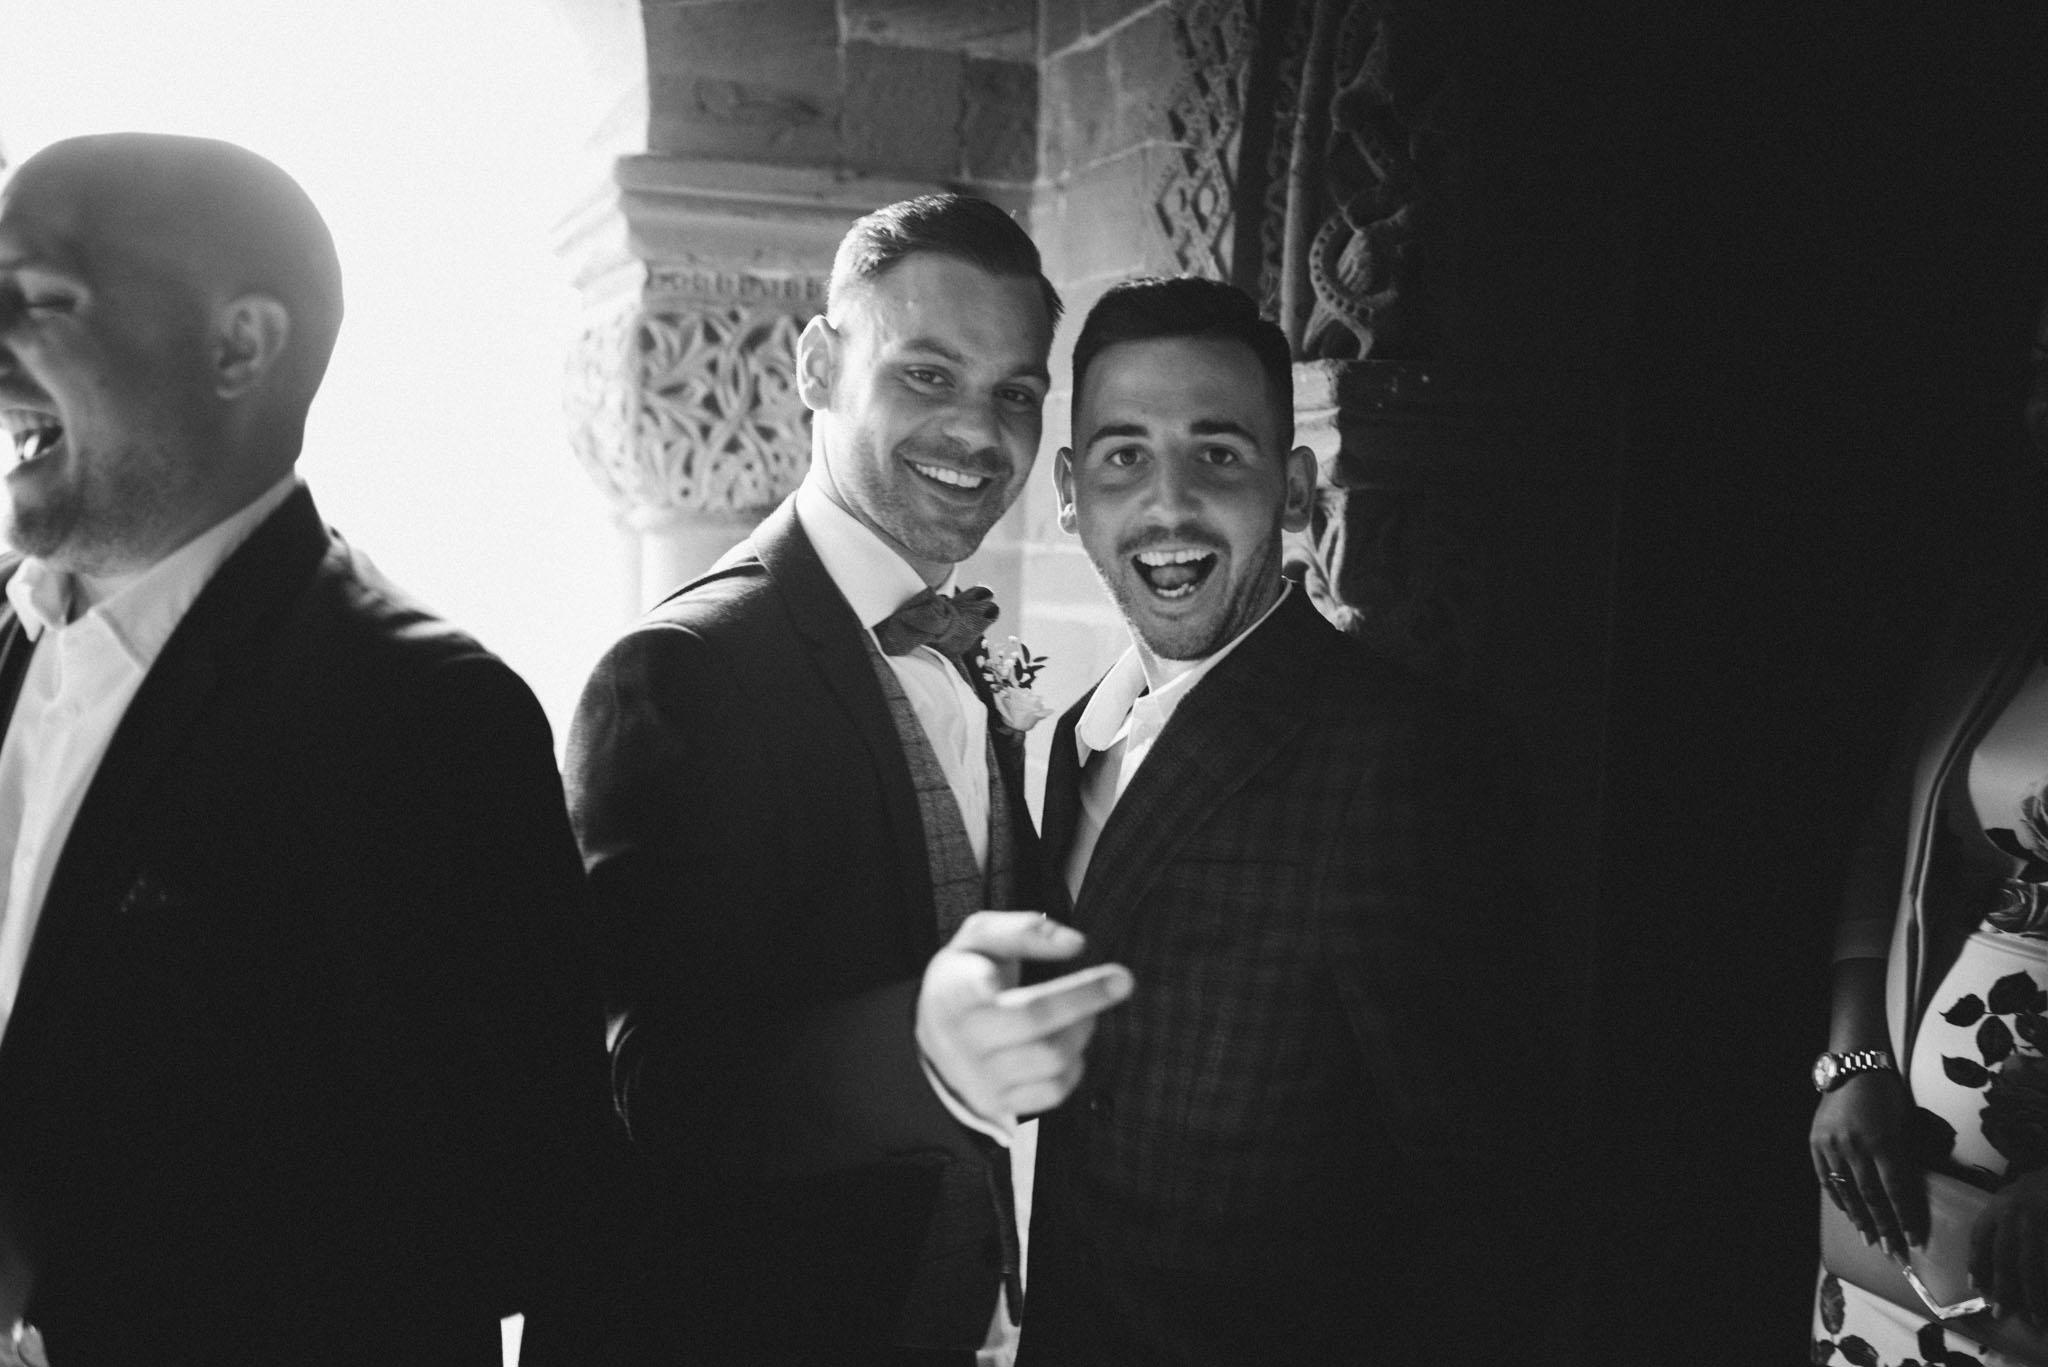 wedding-photographer-glewstone-court-hereford-scott-stockwell-photography246.jpg